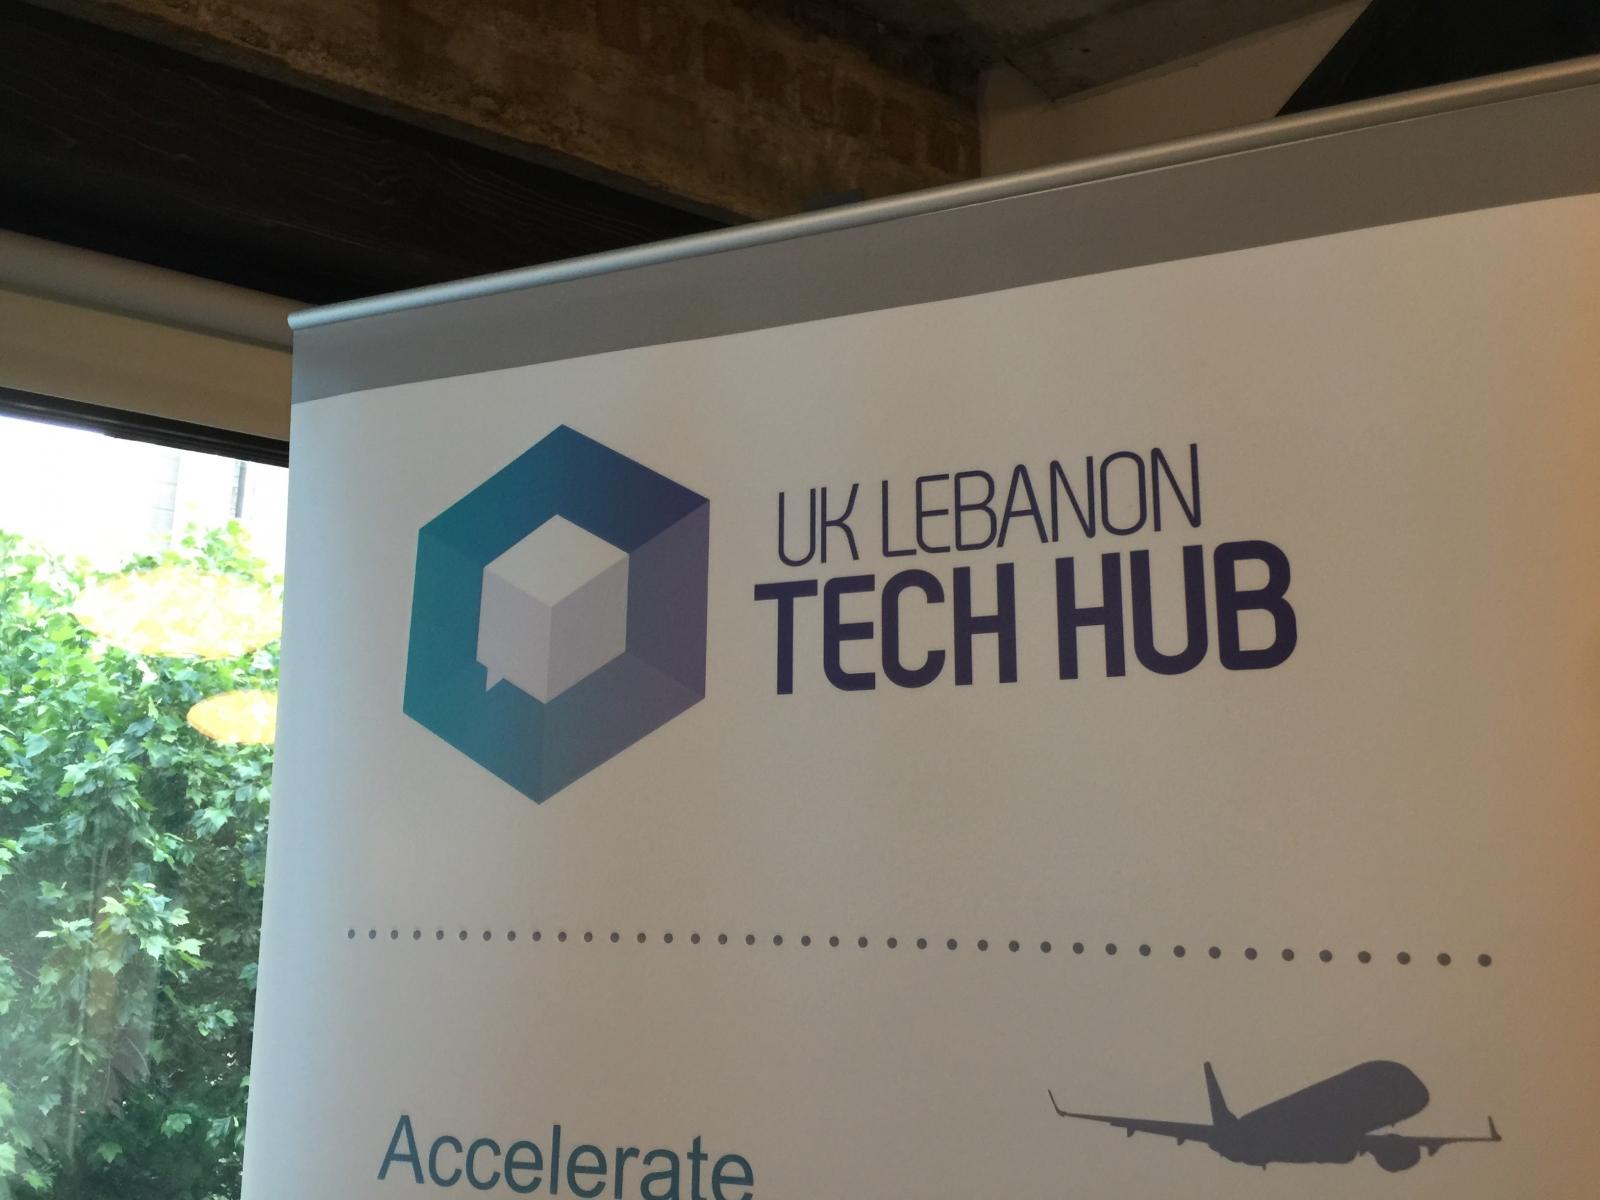 UK Lebanon Tech Hub